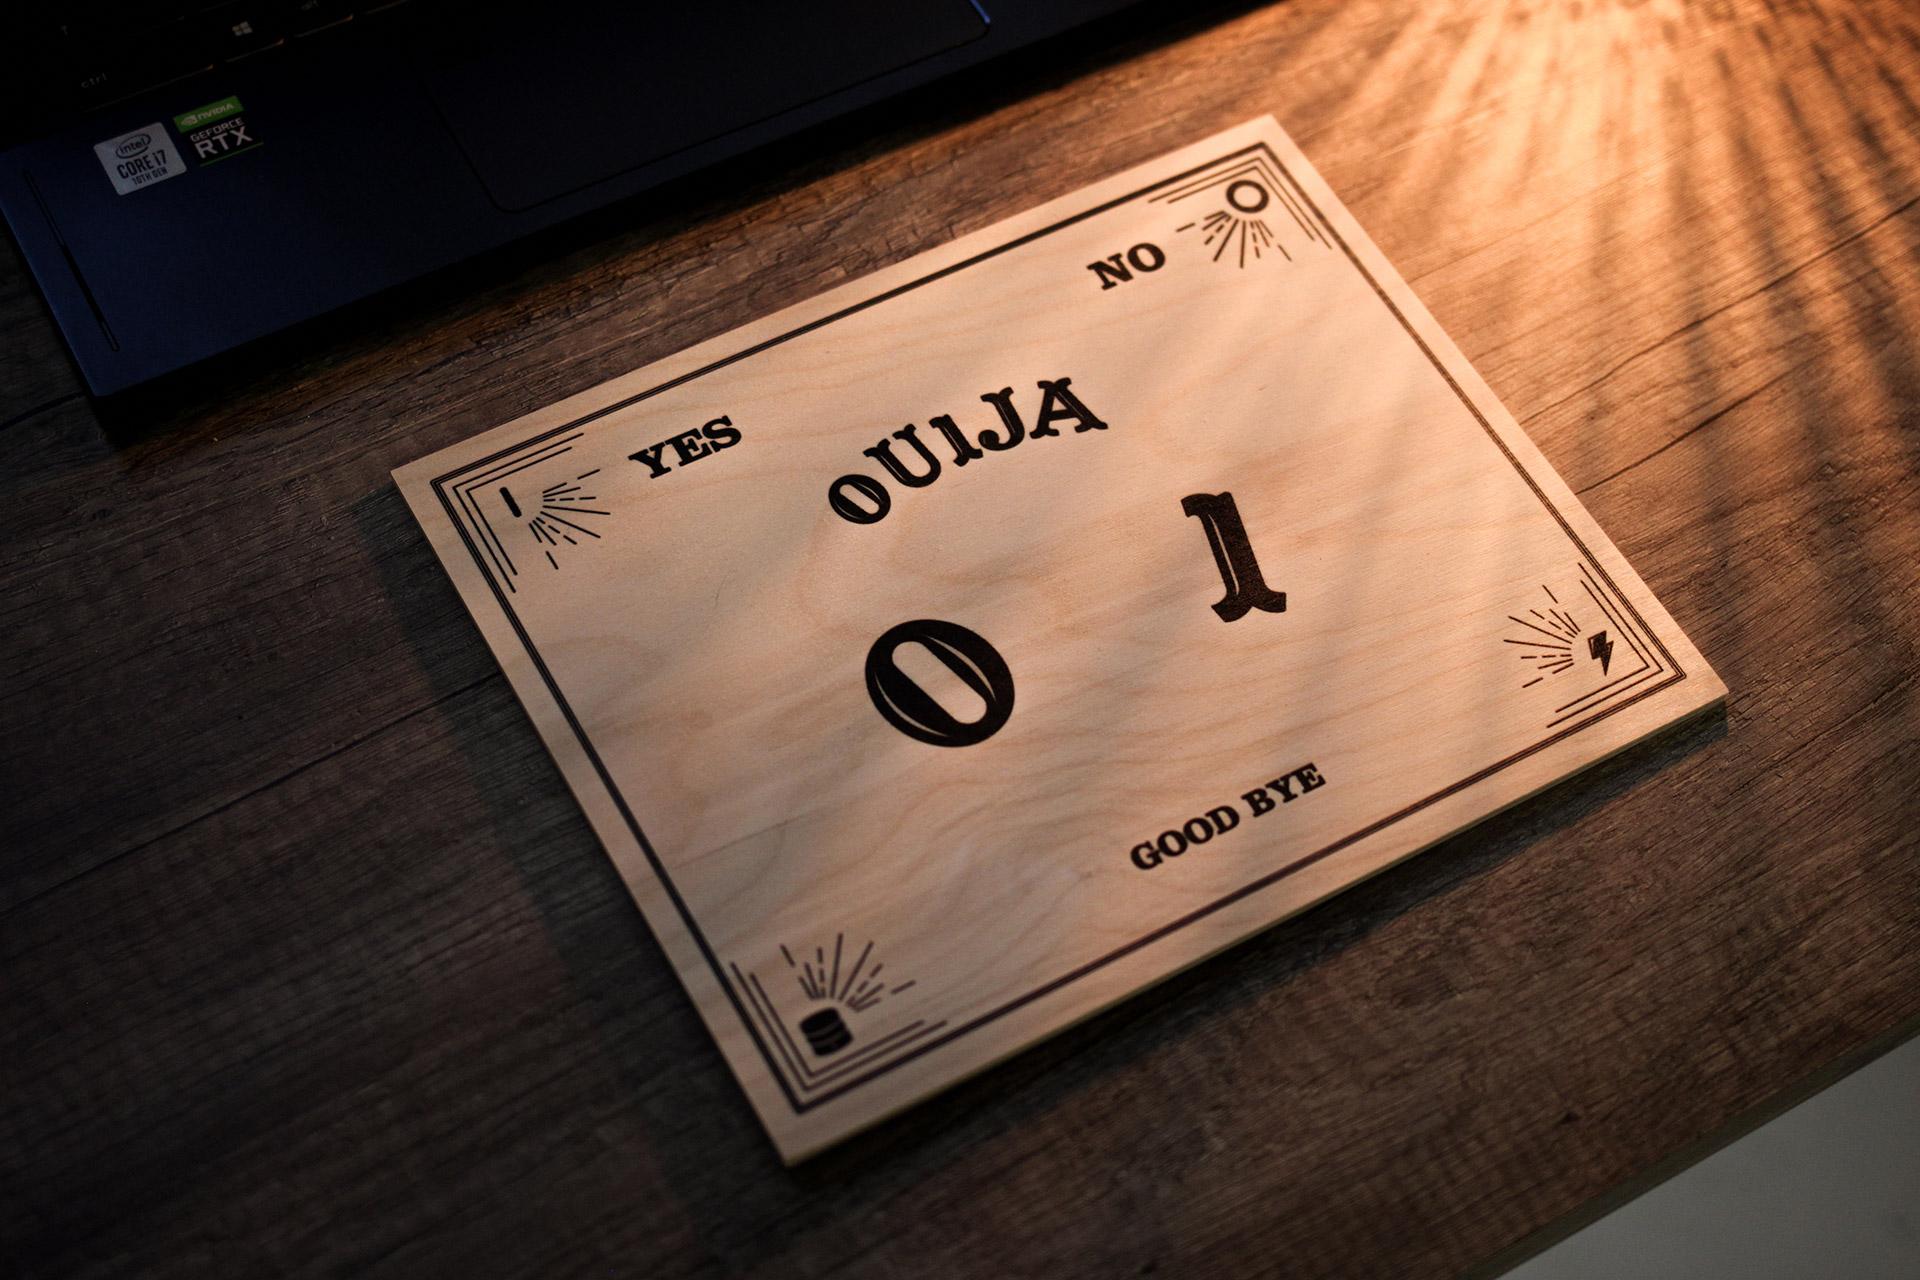 The 0u1ja board